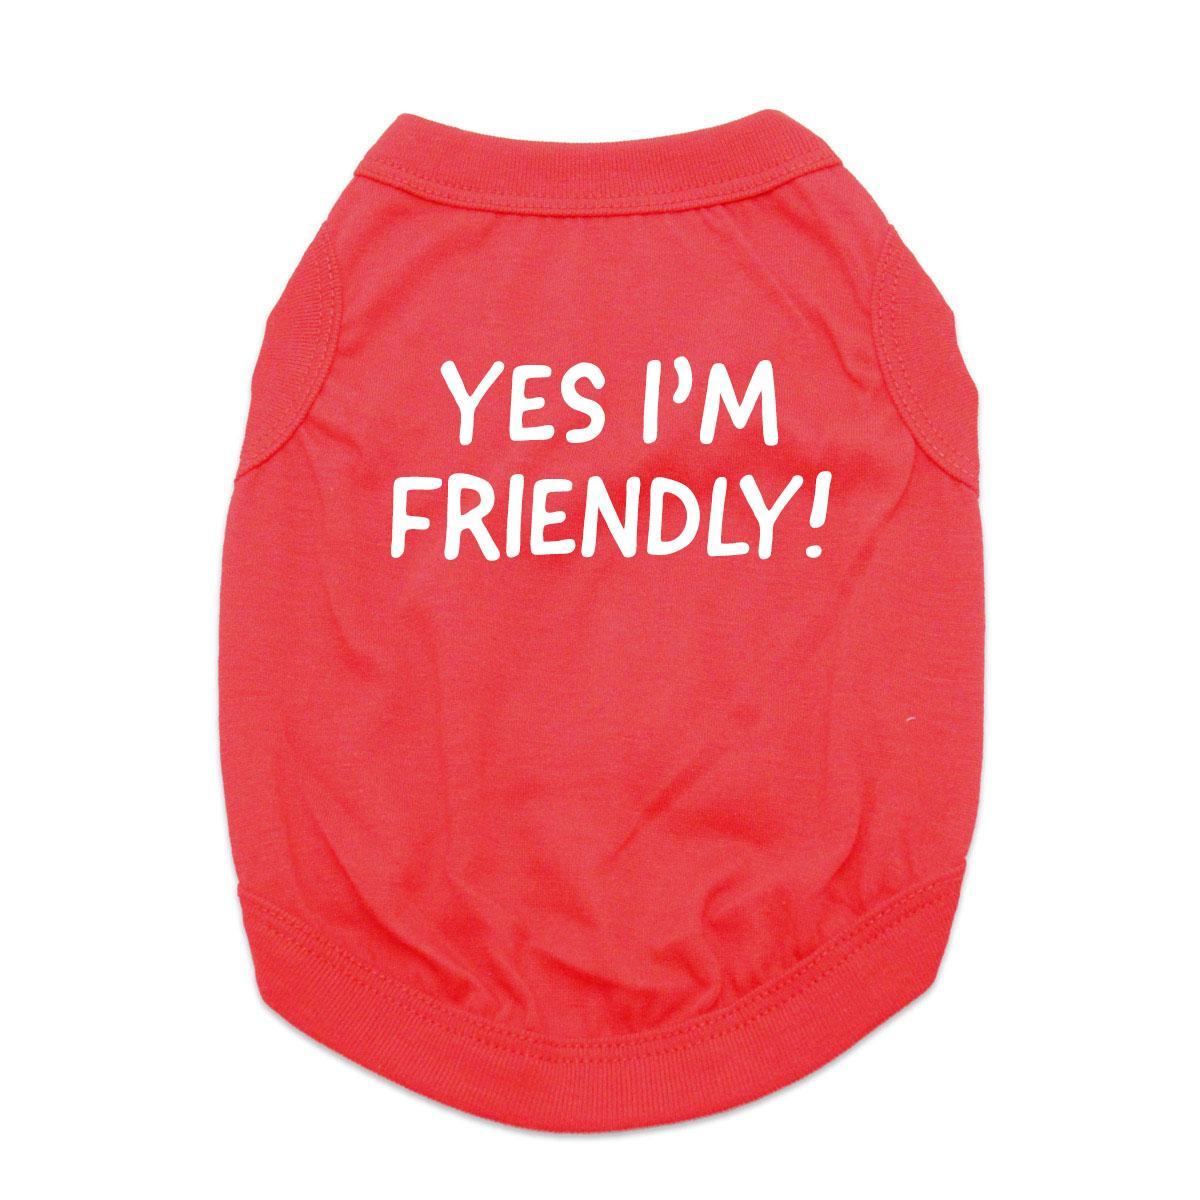 Yes I'm Friendly Dog Shirt - Red